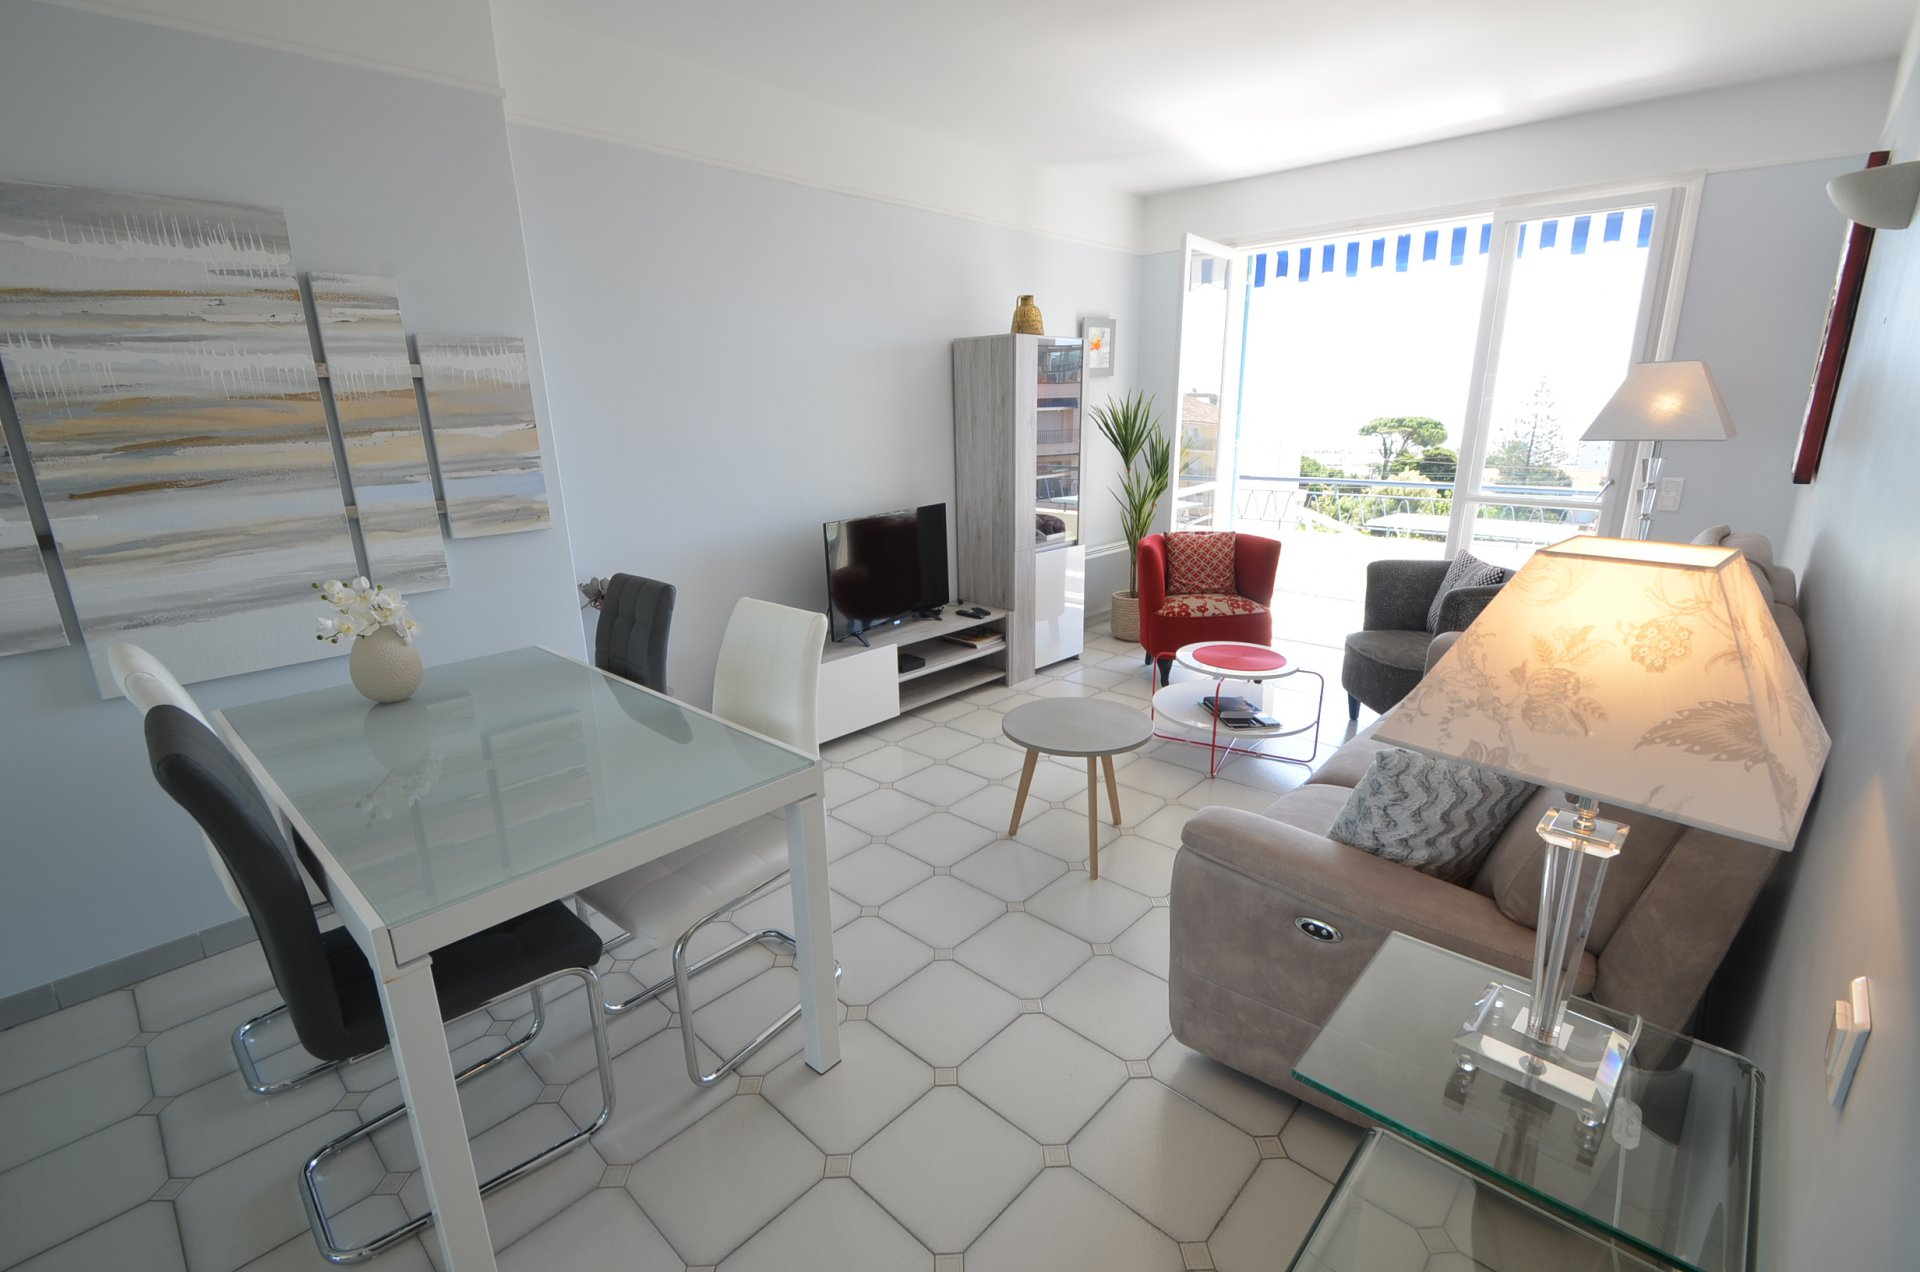 Ventilateur De Salle De Bain Nutone ~ Agence Dumas Appartement Beaulieu Sur Mer